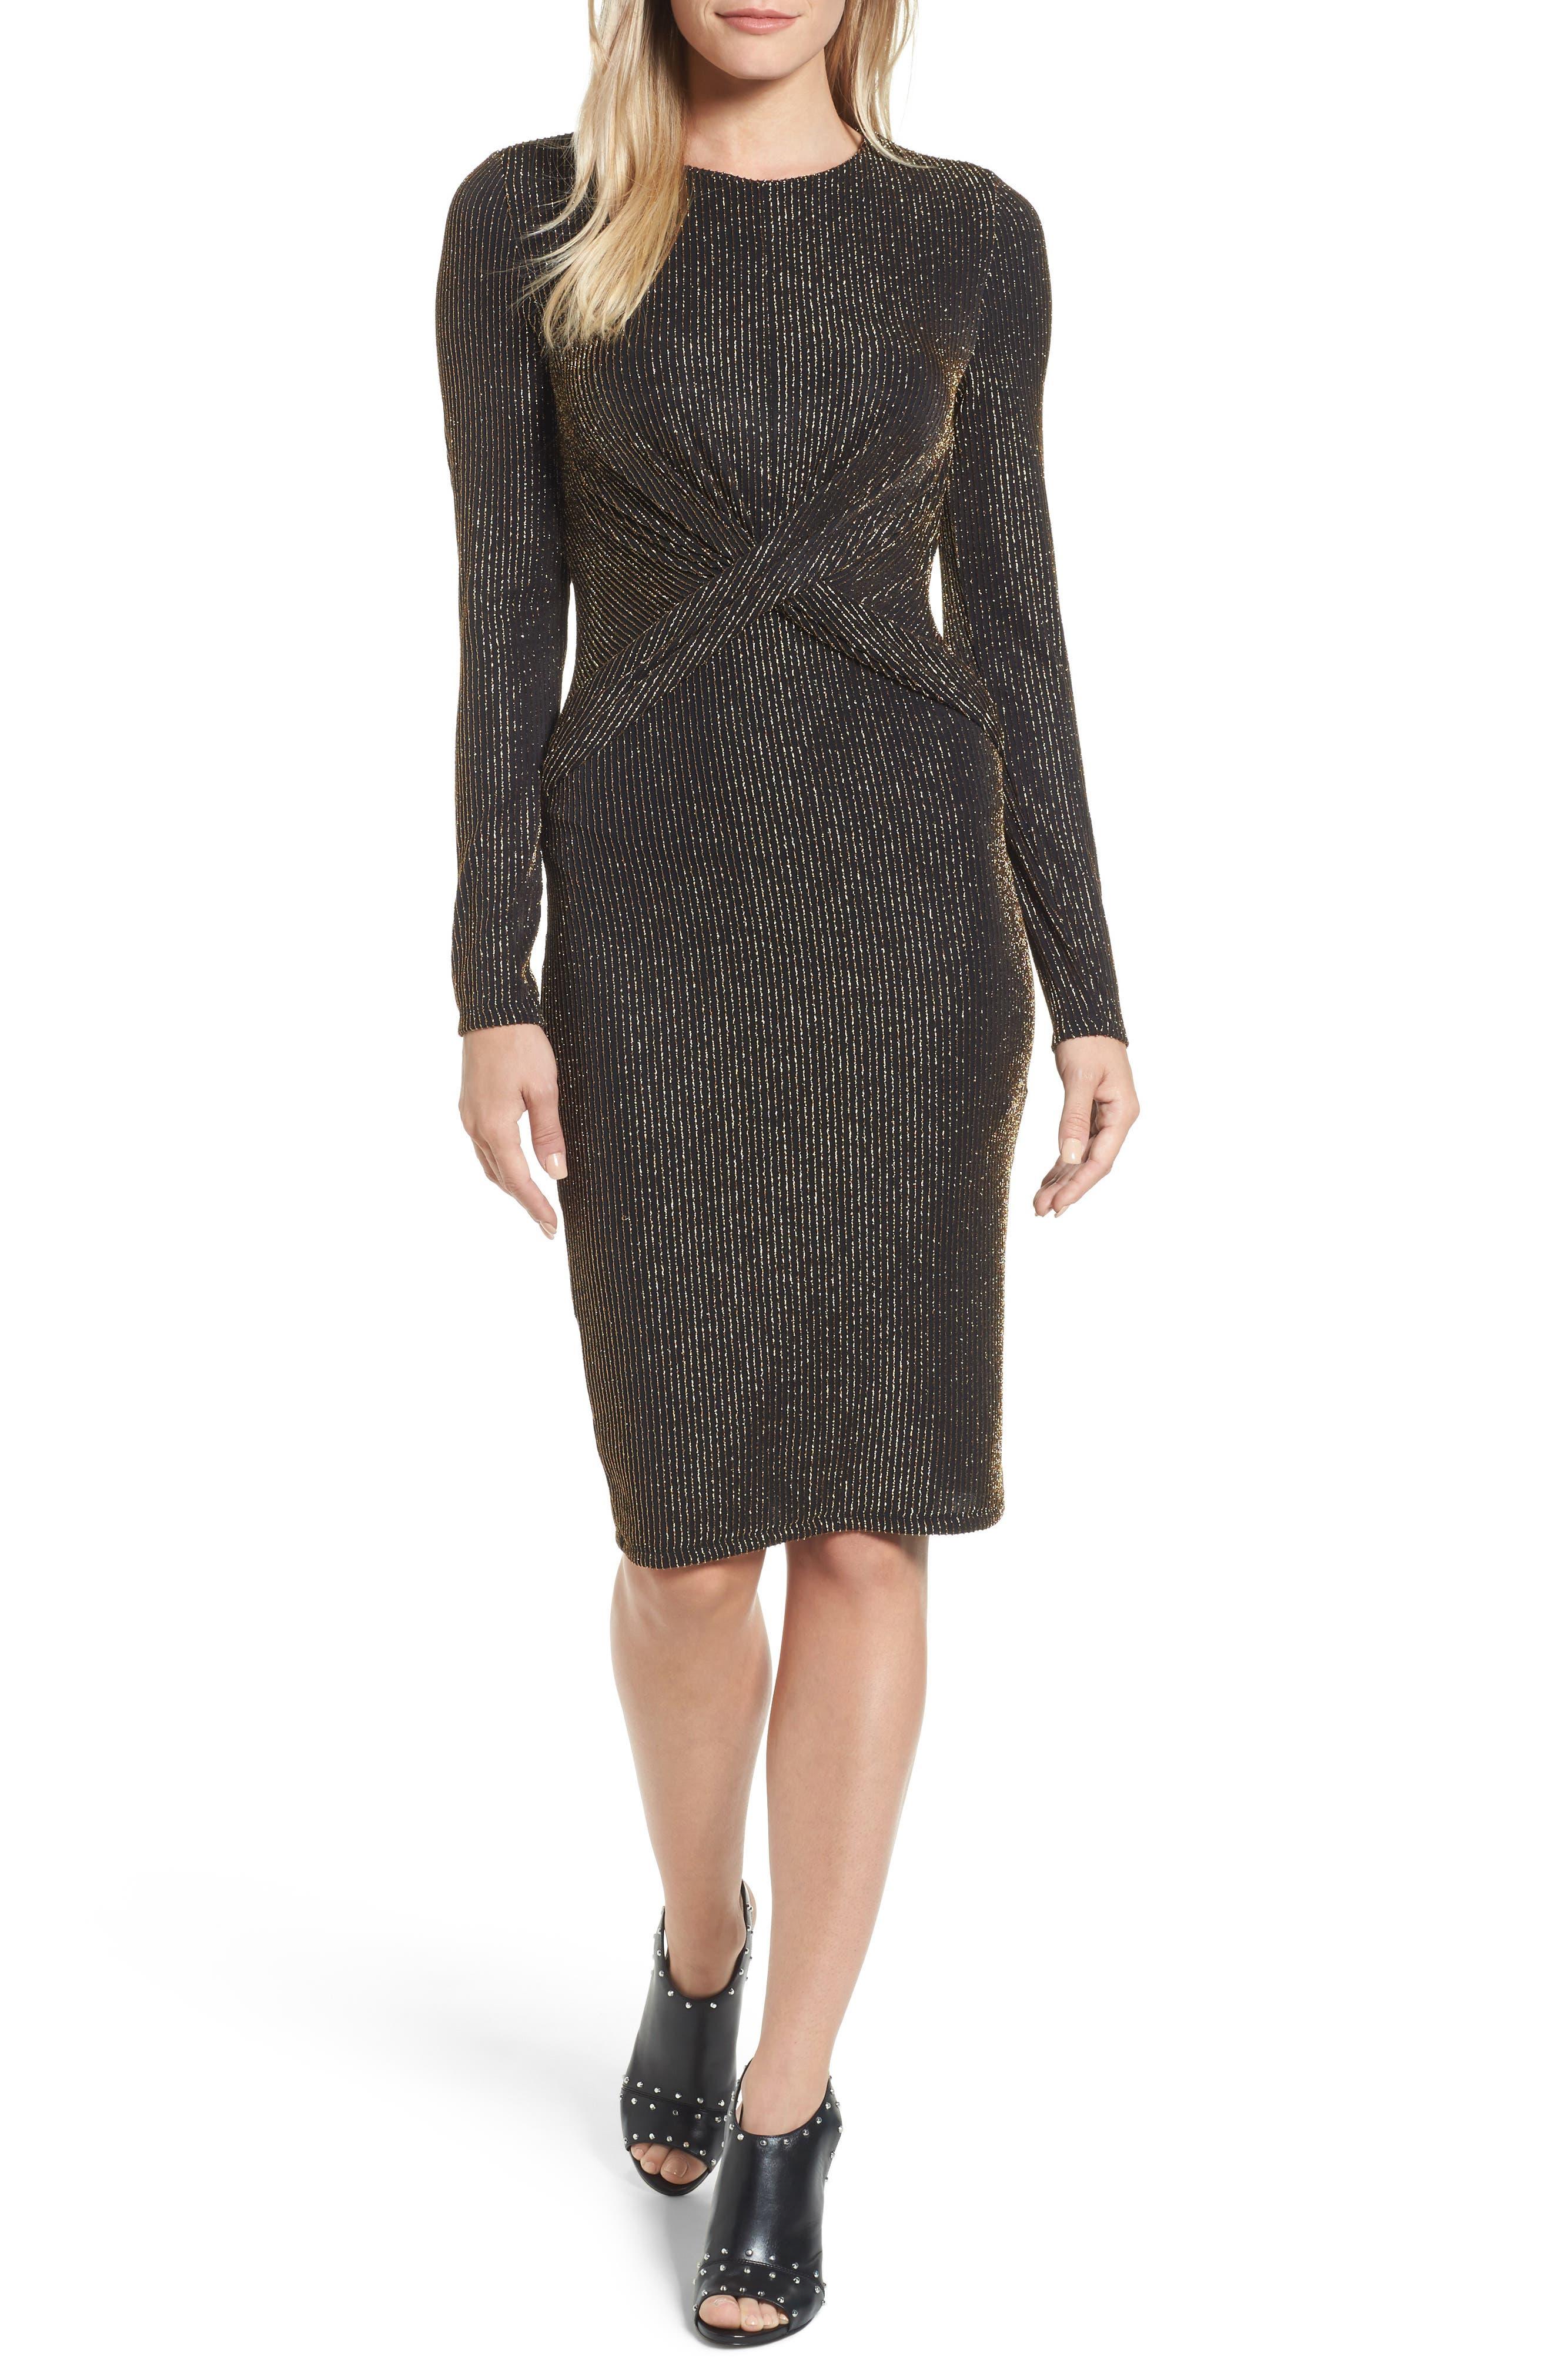 Main Image - MICHAEL Michael Kors Twist Waist Metallic Dress